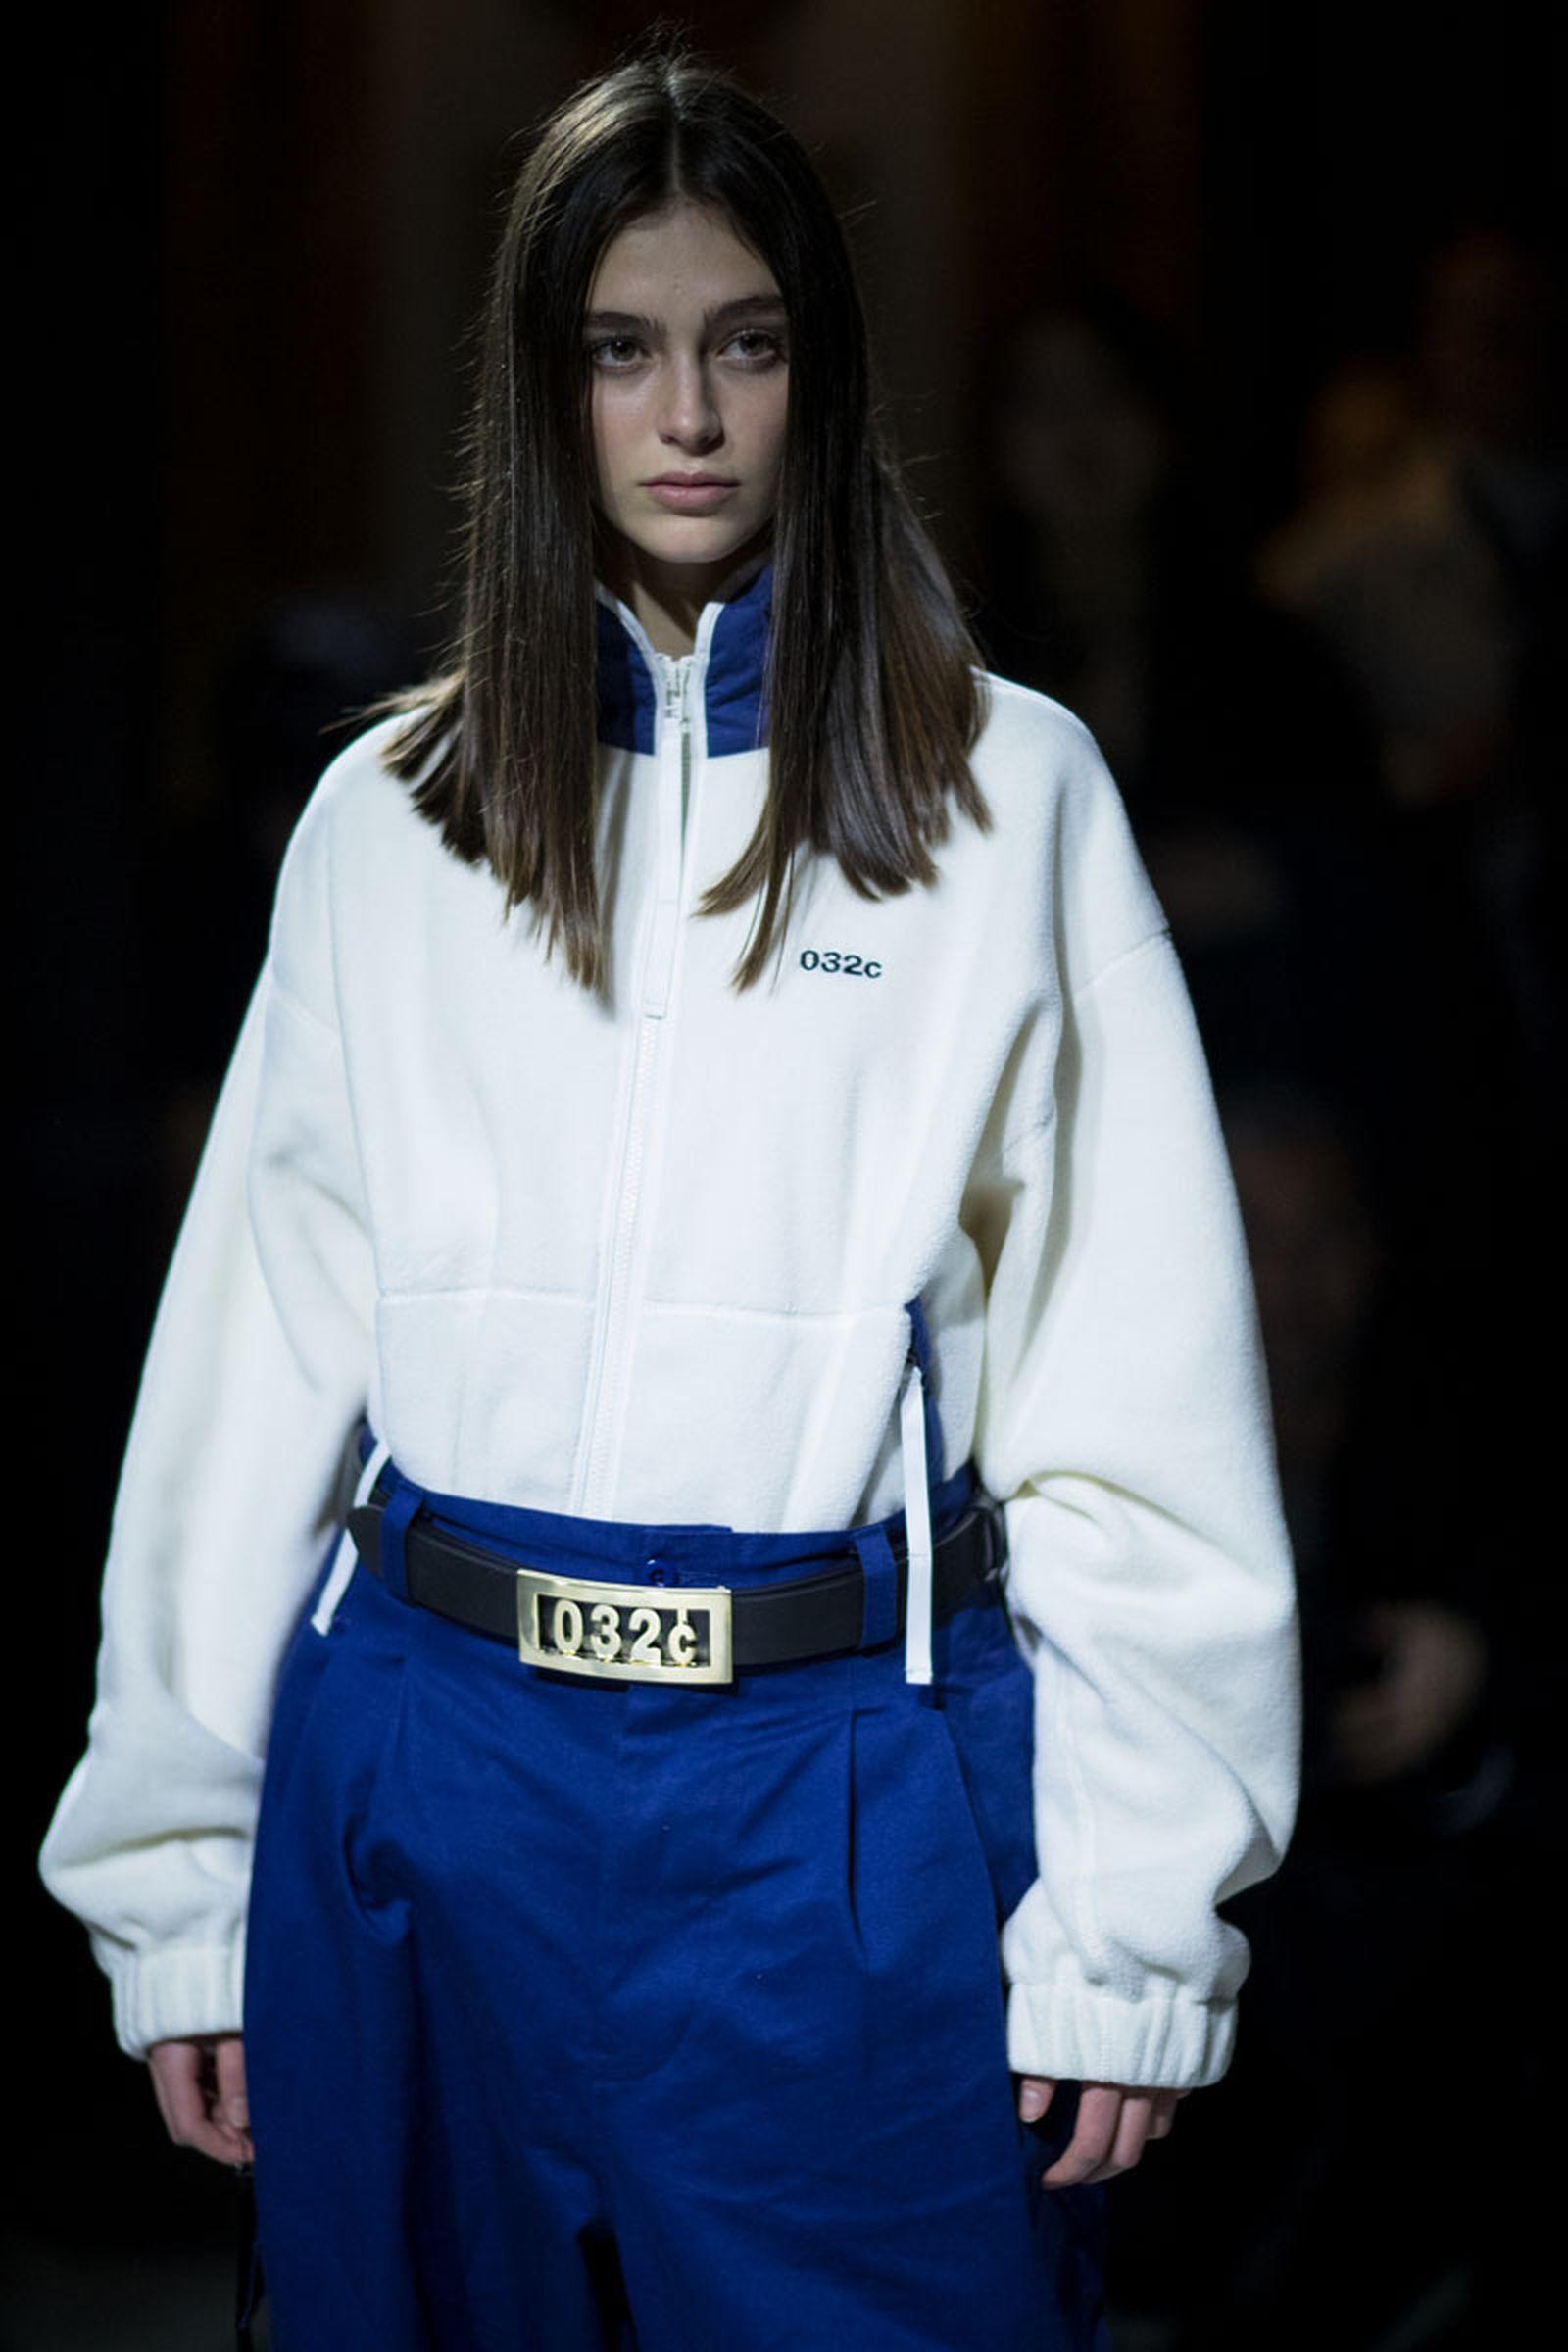 german clothing brands 032c german clothing brands 023c Adidas Boulezar